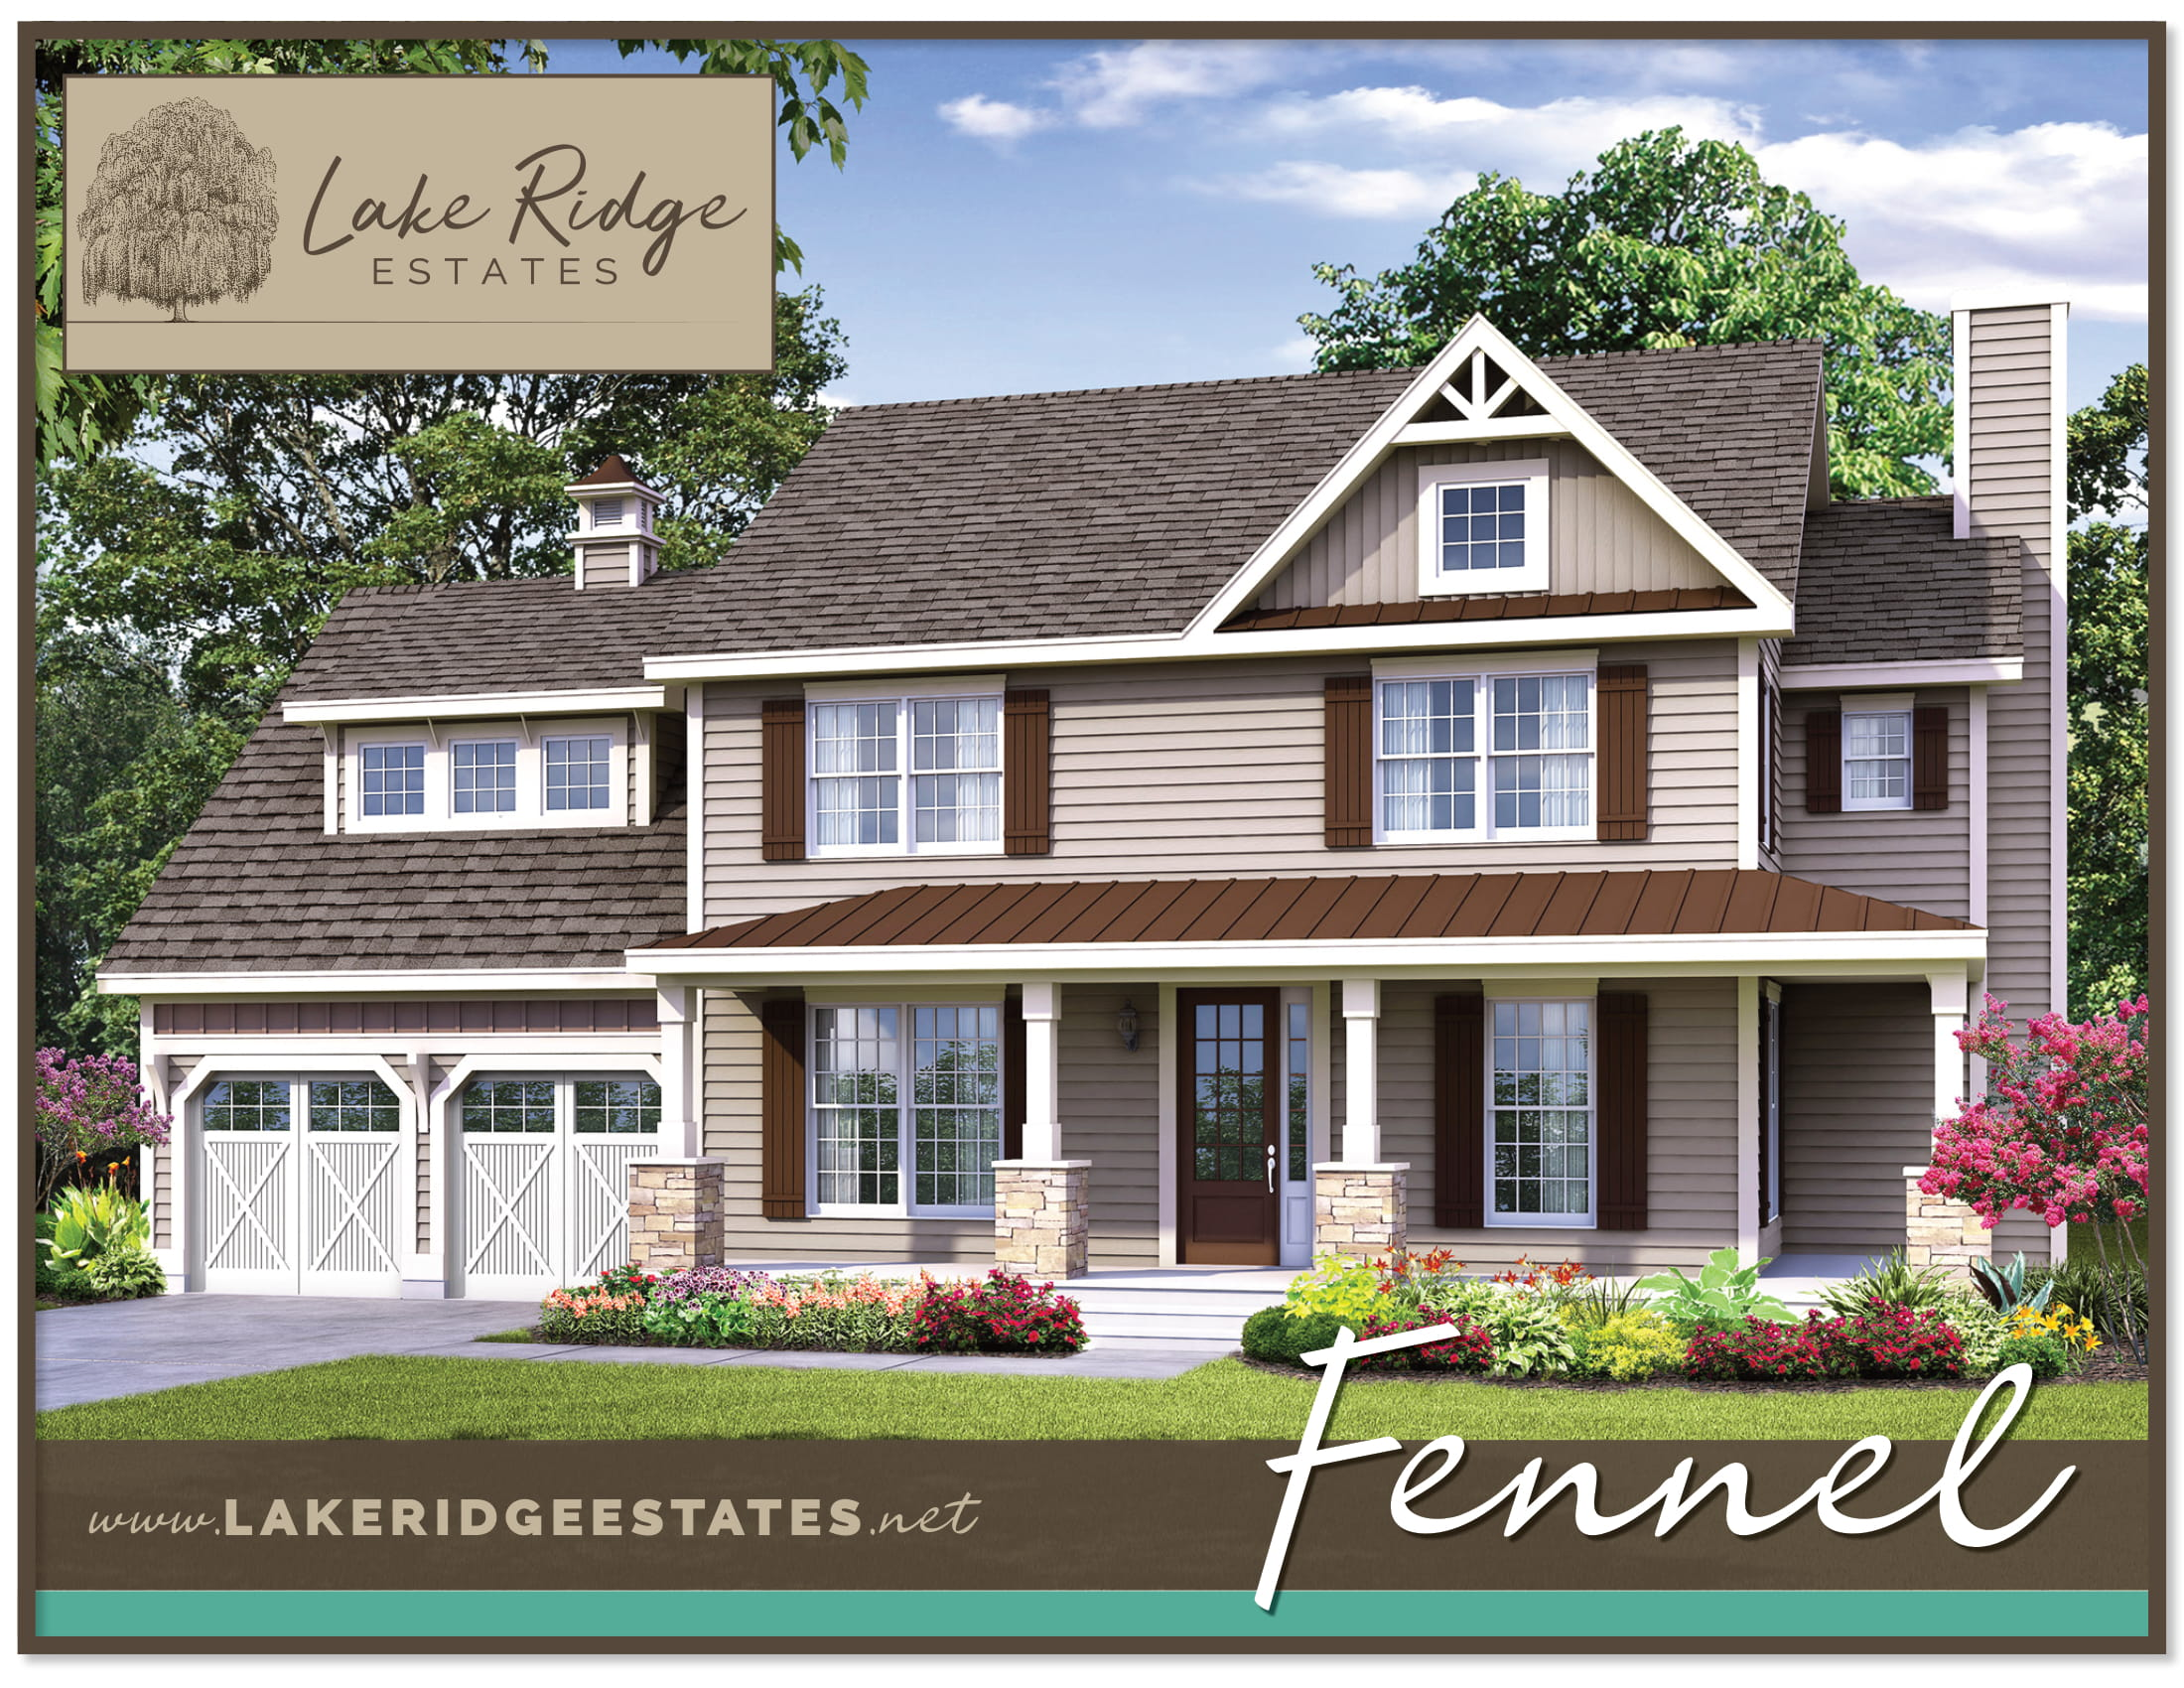 Christopher Ogden Middletown Ny Real Estate Thefennel Lakeridge 1 1